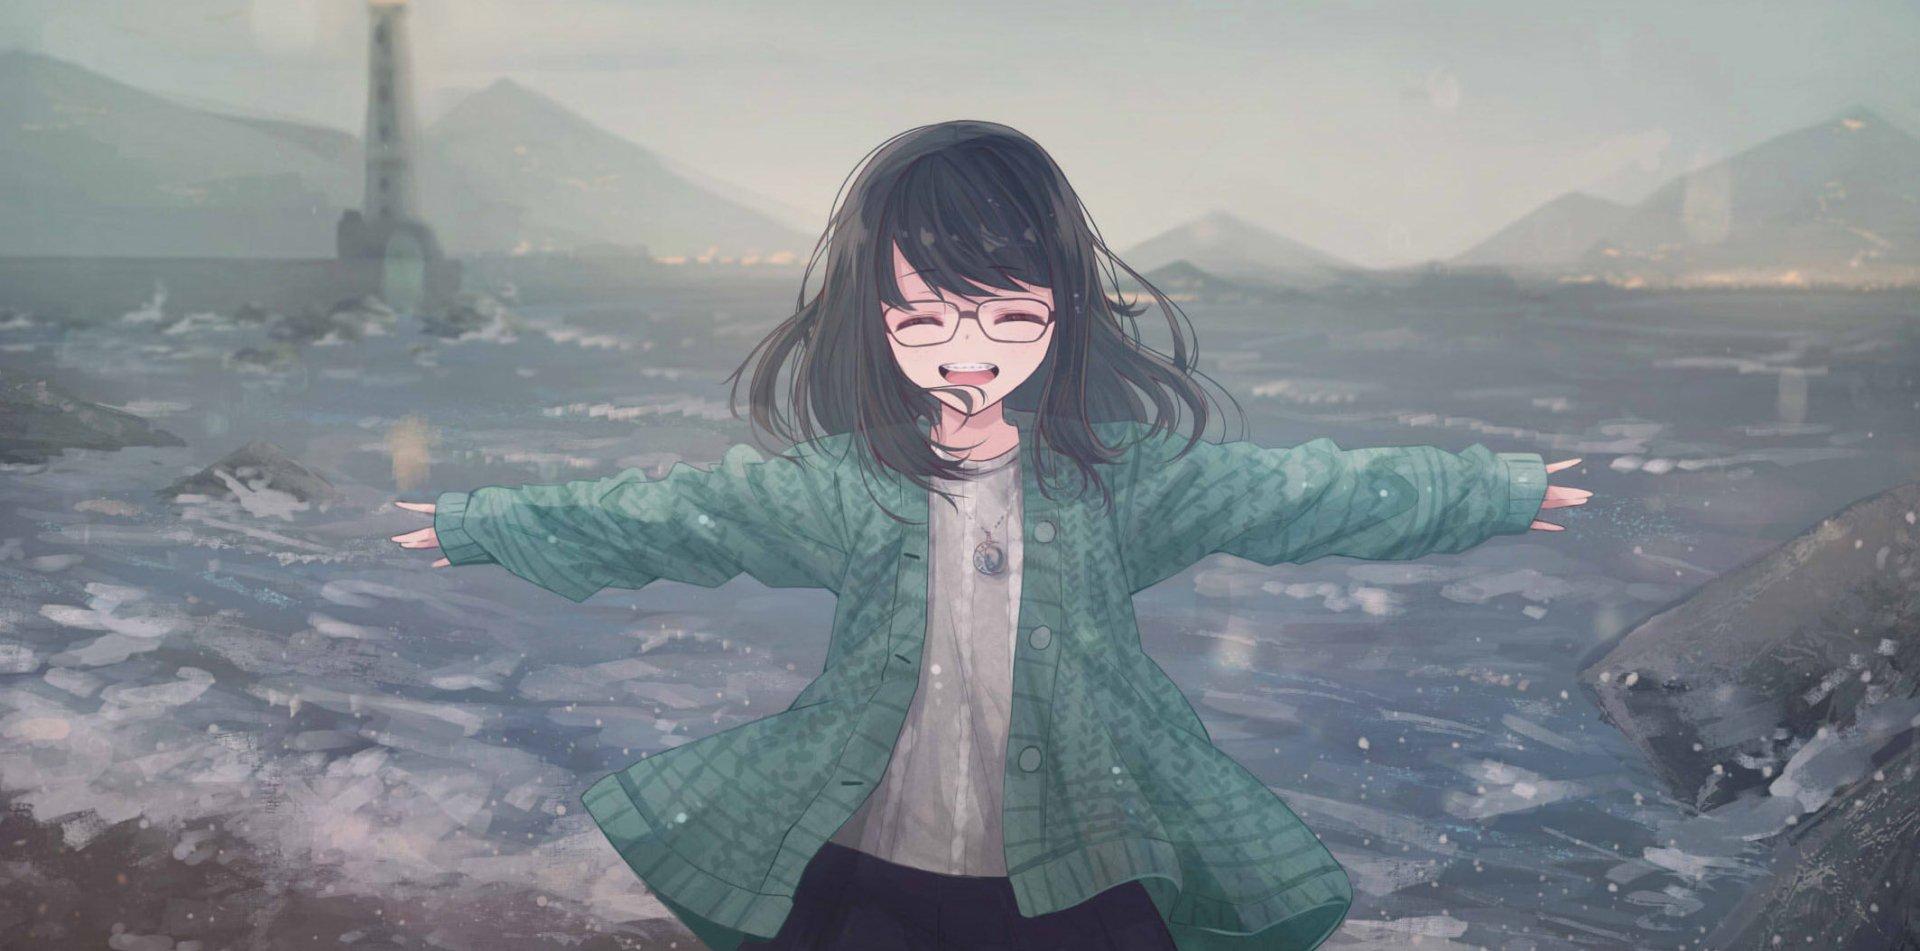 Anime - Original  Lighthouse Sea Glass Jacket Black Hair Wallpaper